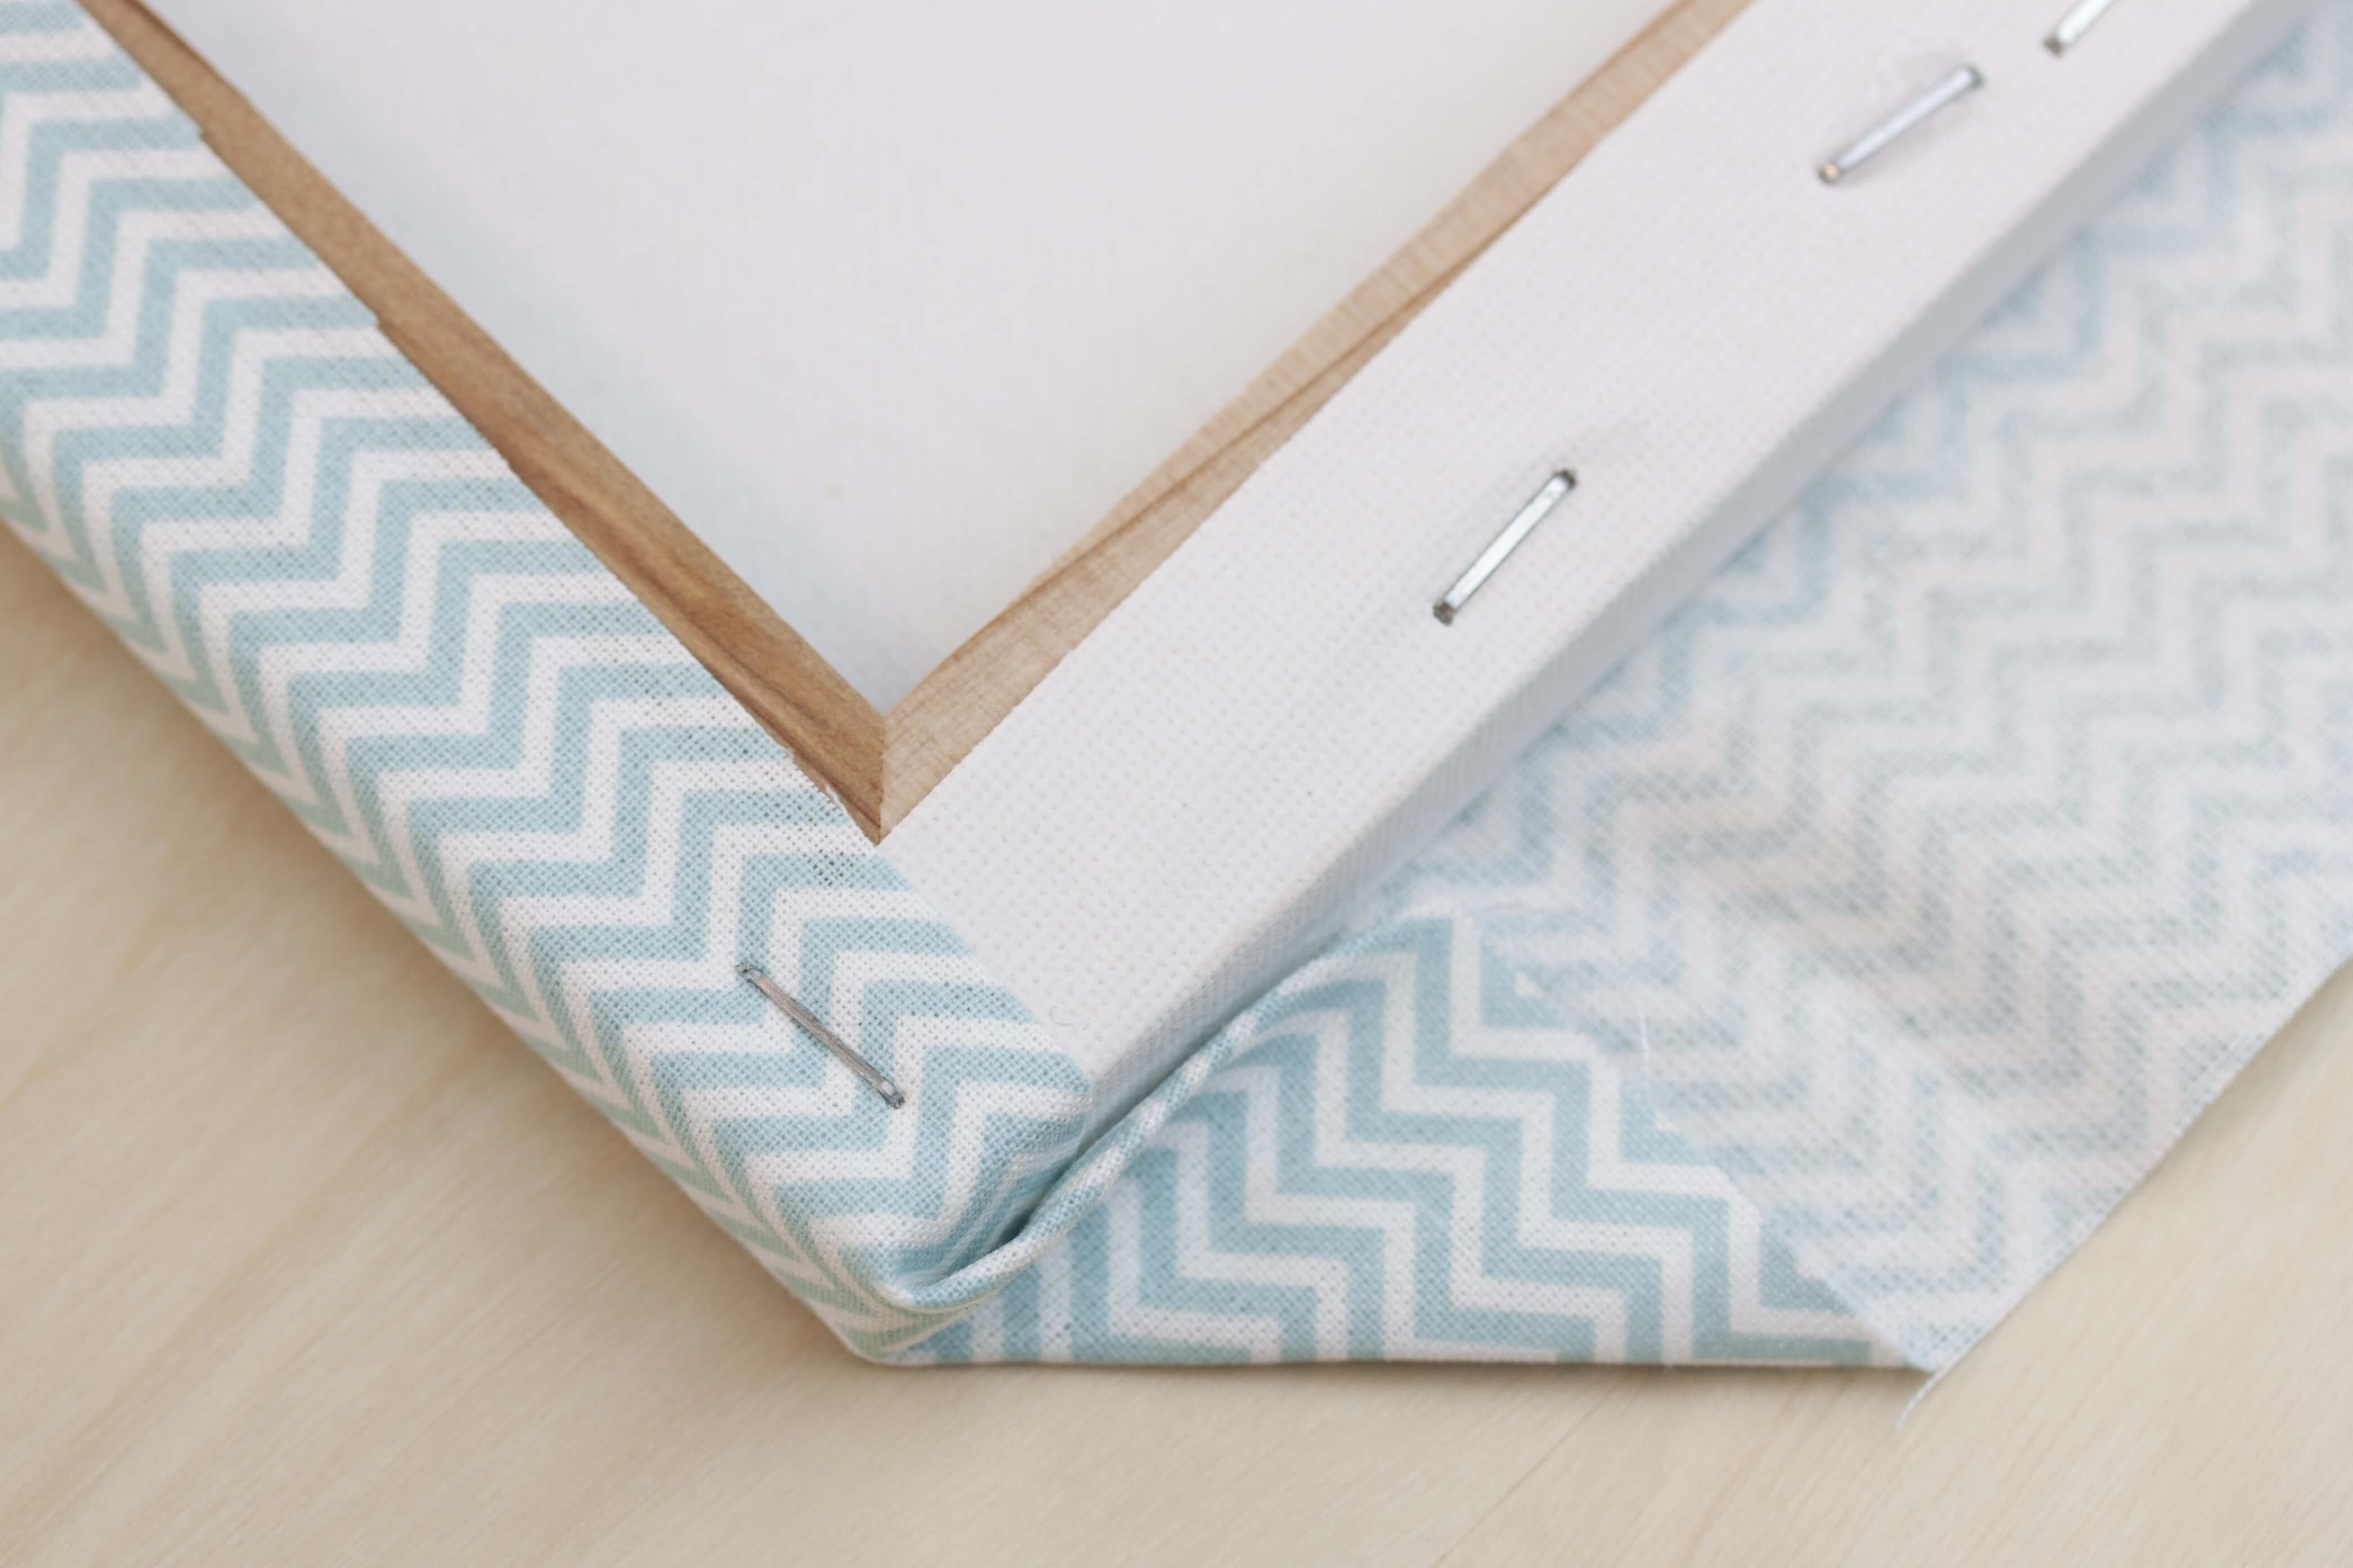 pinnwand selber machen stoff magnettafeln mit stoff. Black Bedroom Furniture Sets. Home Design Ideas